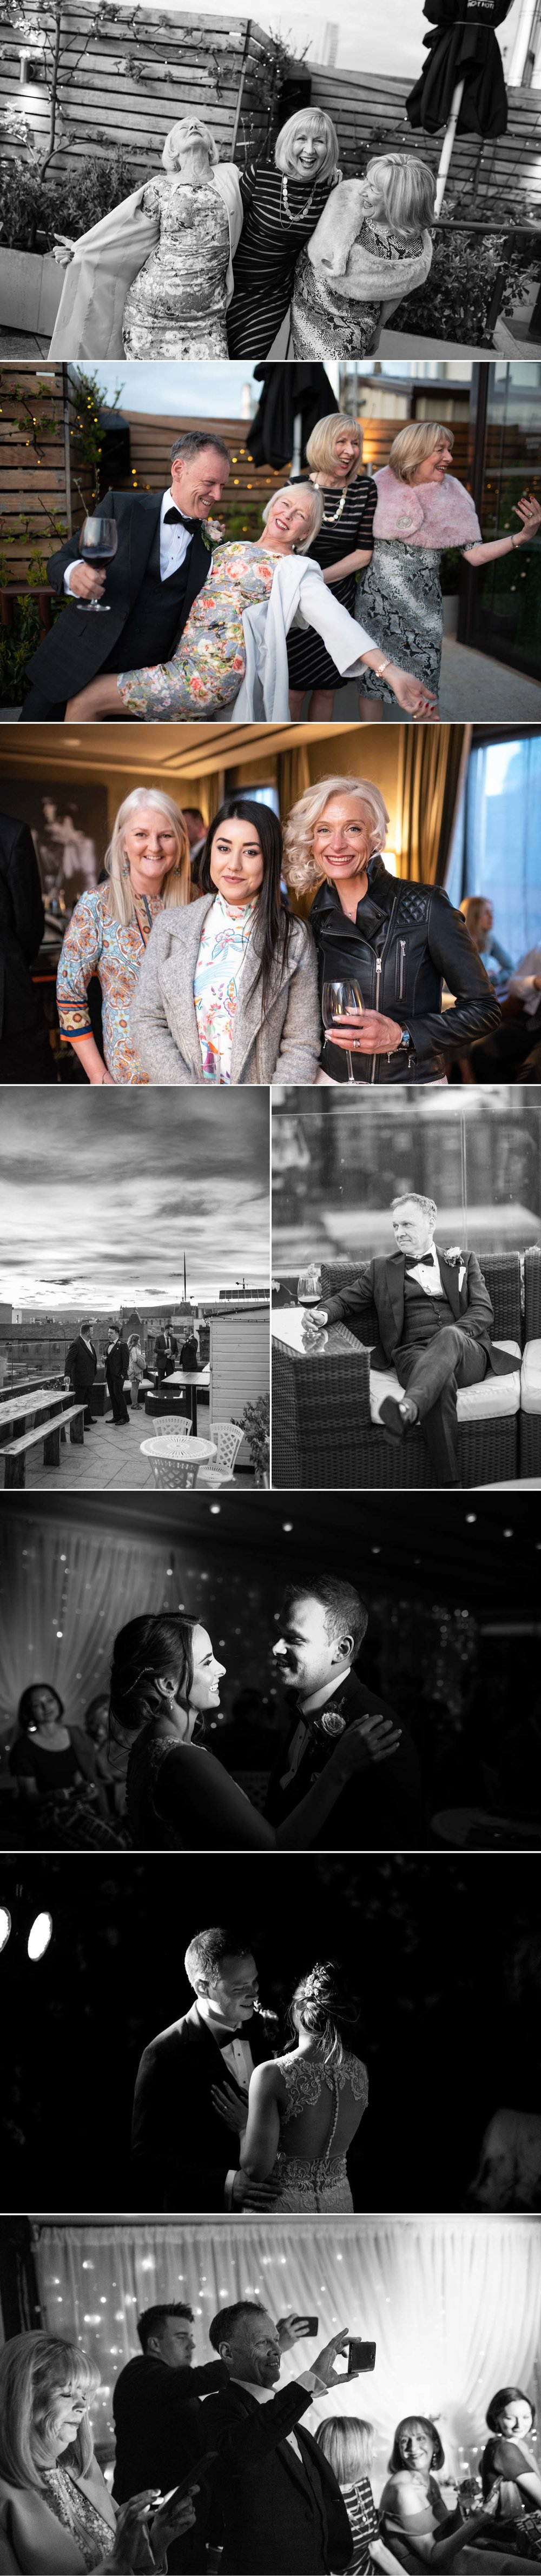 Merchant Hotel Belfast Wedding Photography James McGrillis 20.jpg